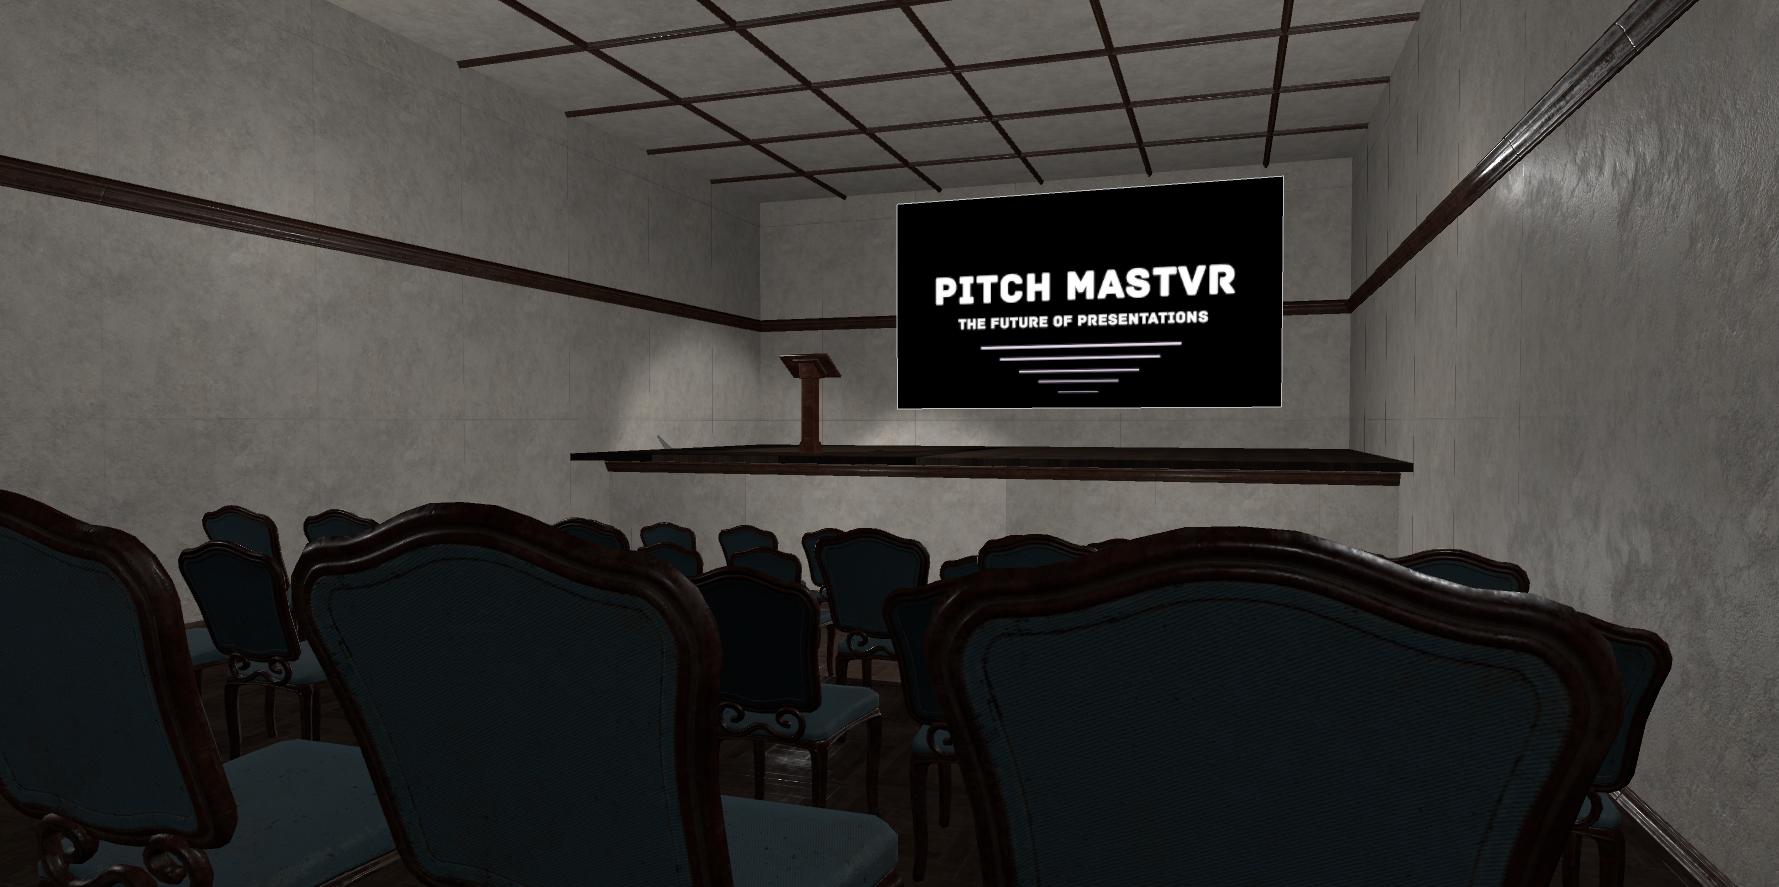 PitchMastVR